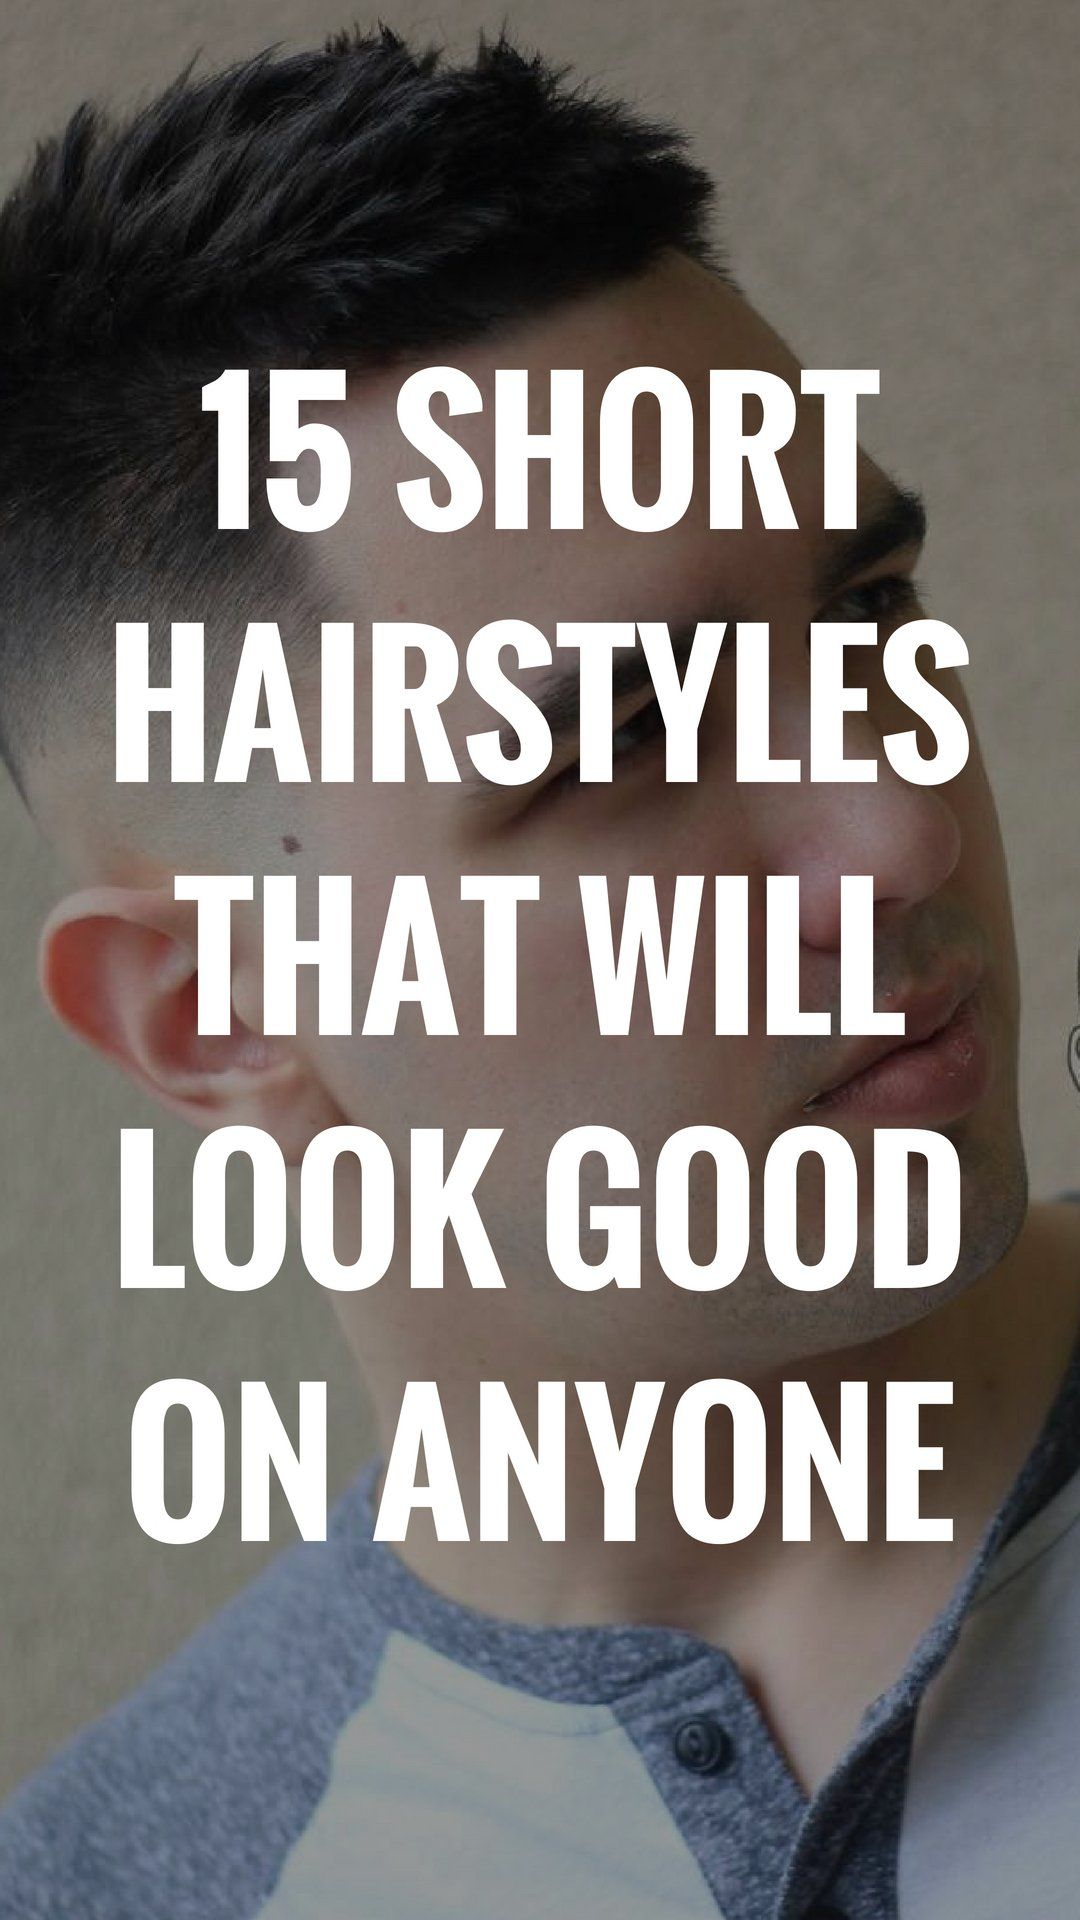 Haircut styles for men 2018  short hairstyles for men  short summer  menus hairstyles